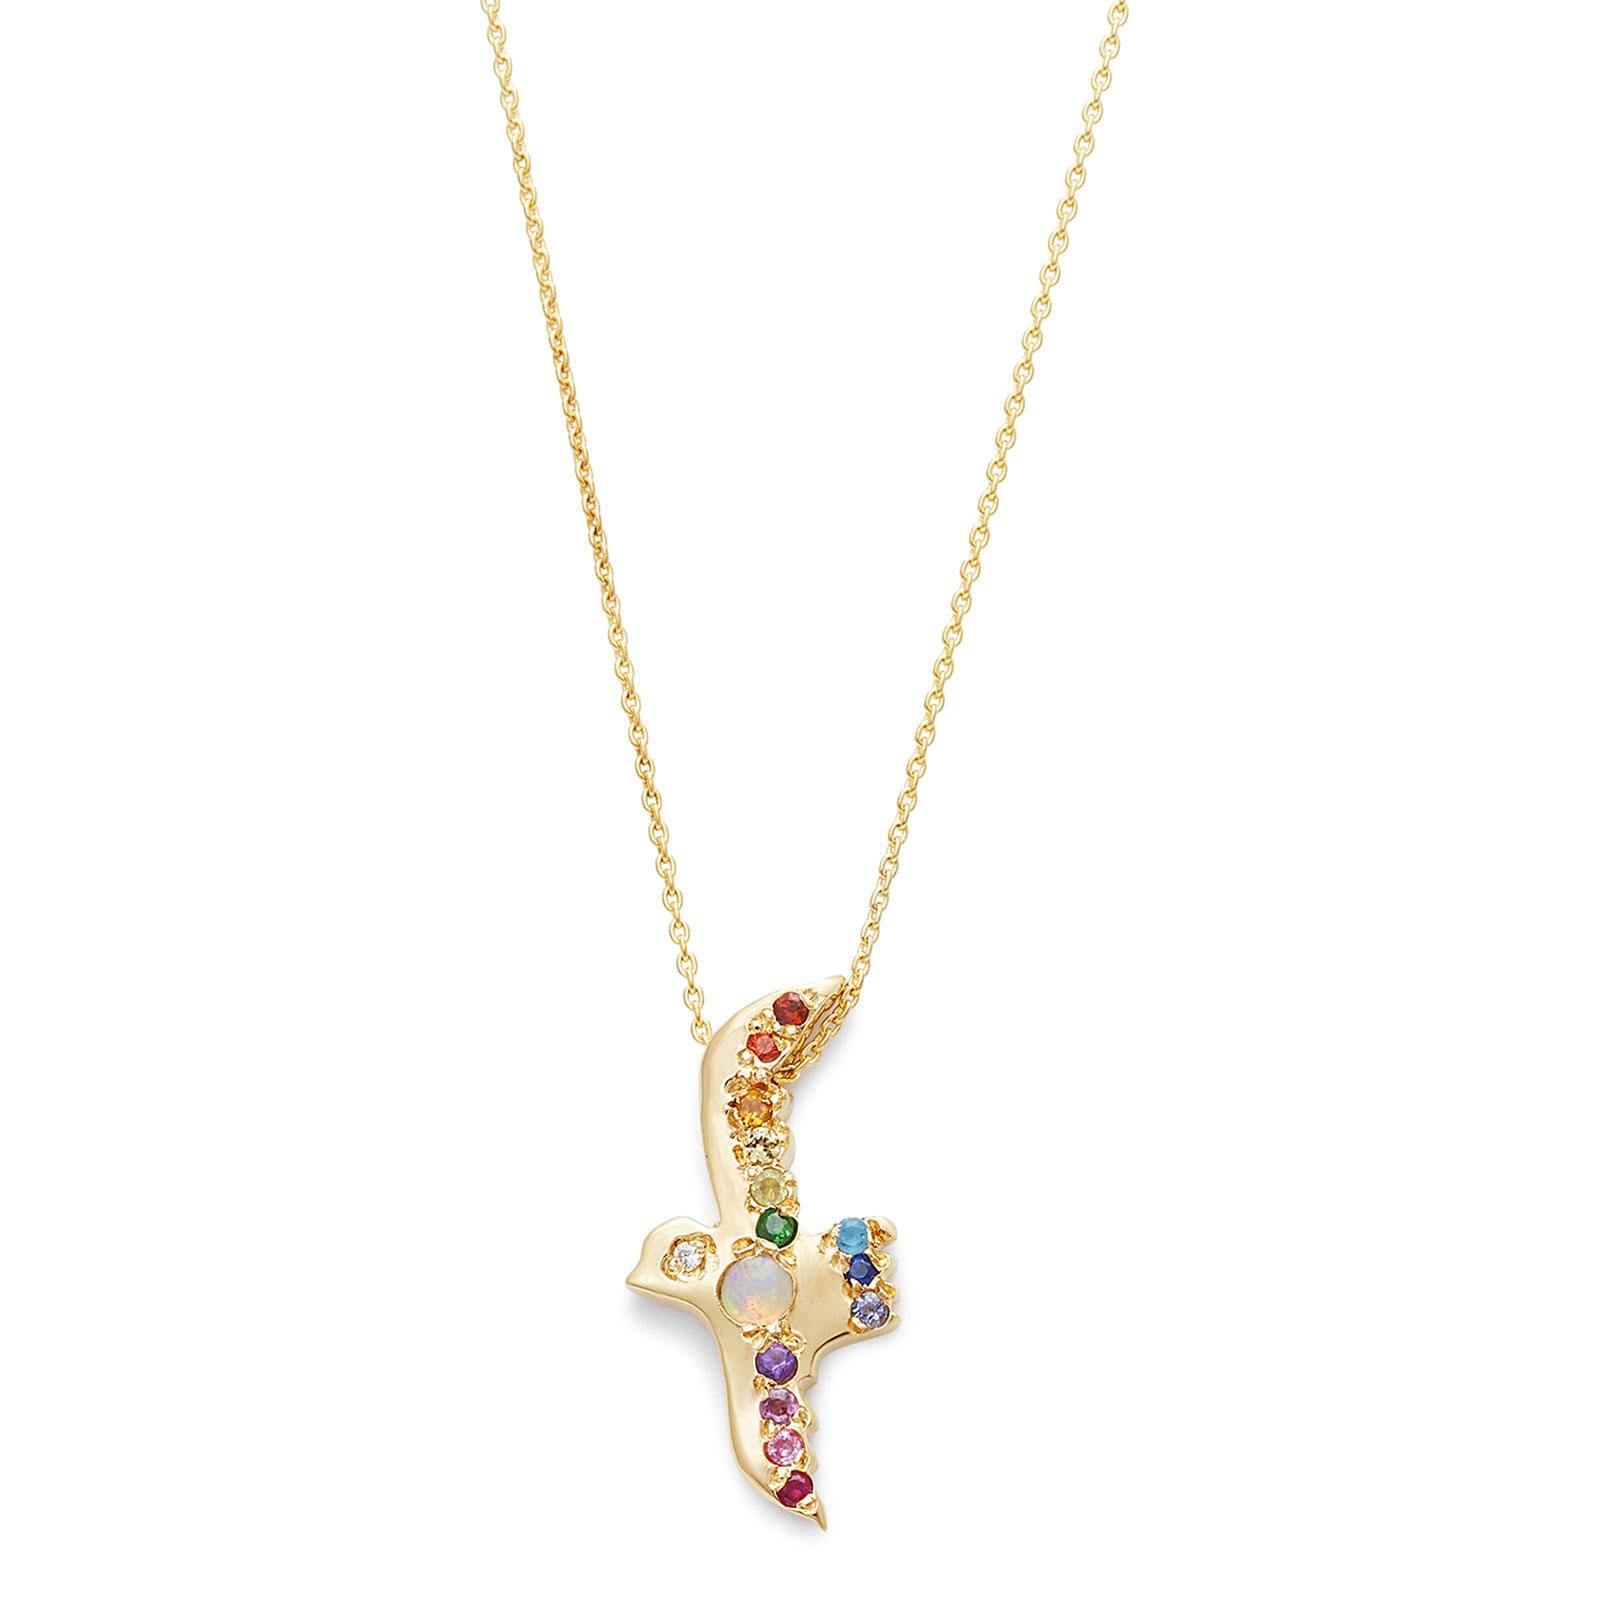 Opal Rainbow Flying Bird Necklace yellow gold